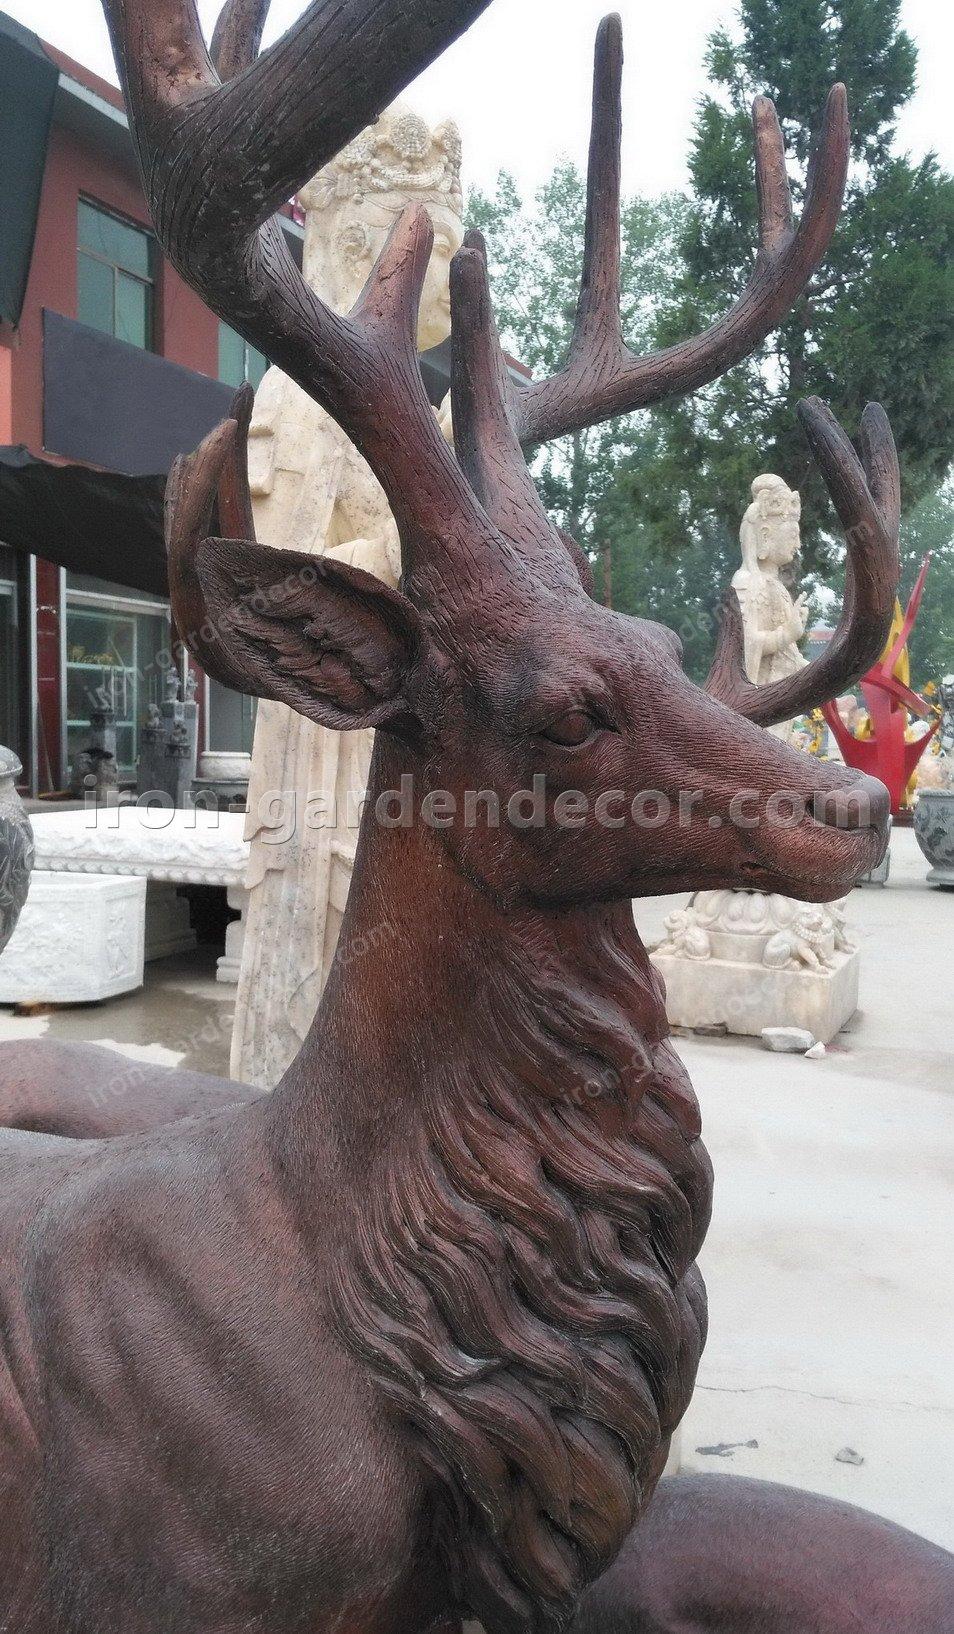 Home decoration outdoor garden stage animal resin statue fiberglass-DEER FAMILY FS076 (2)